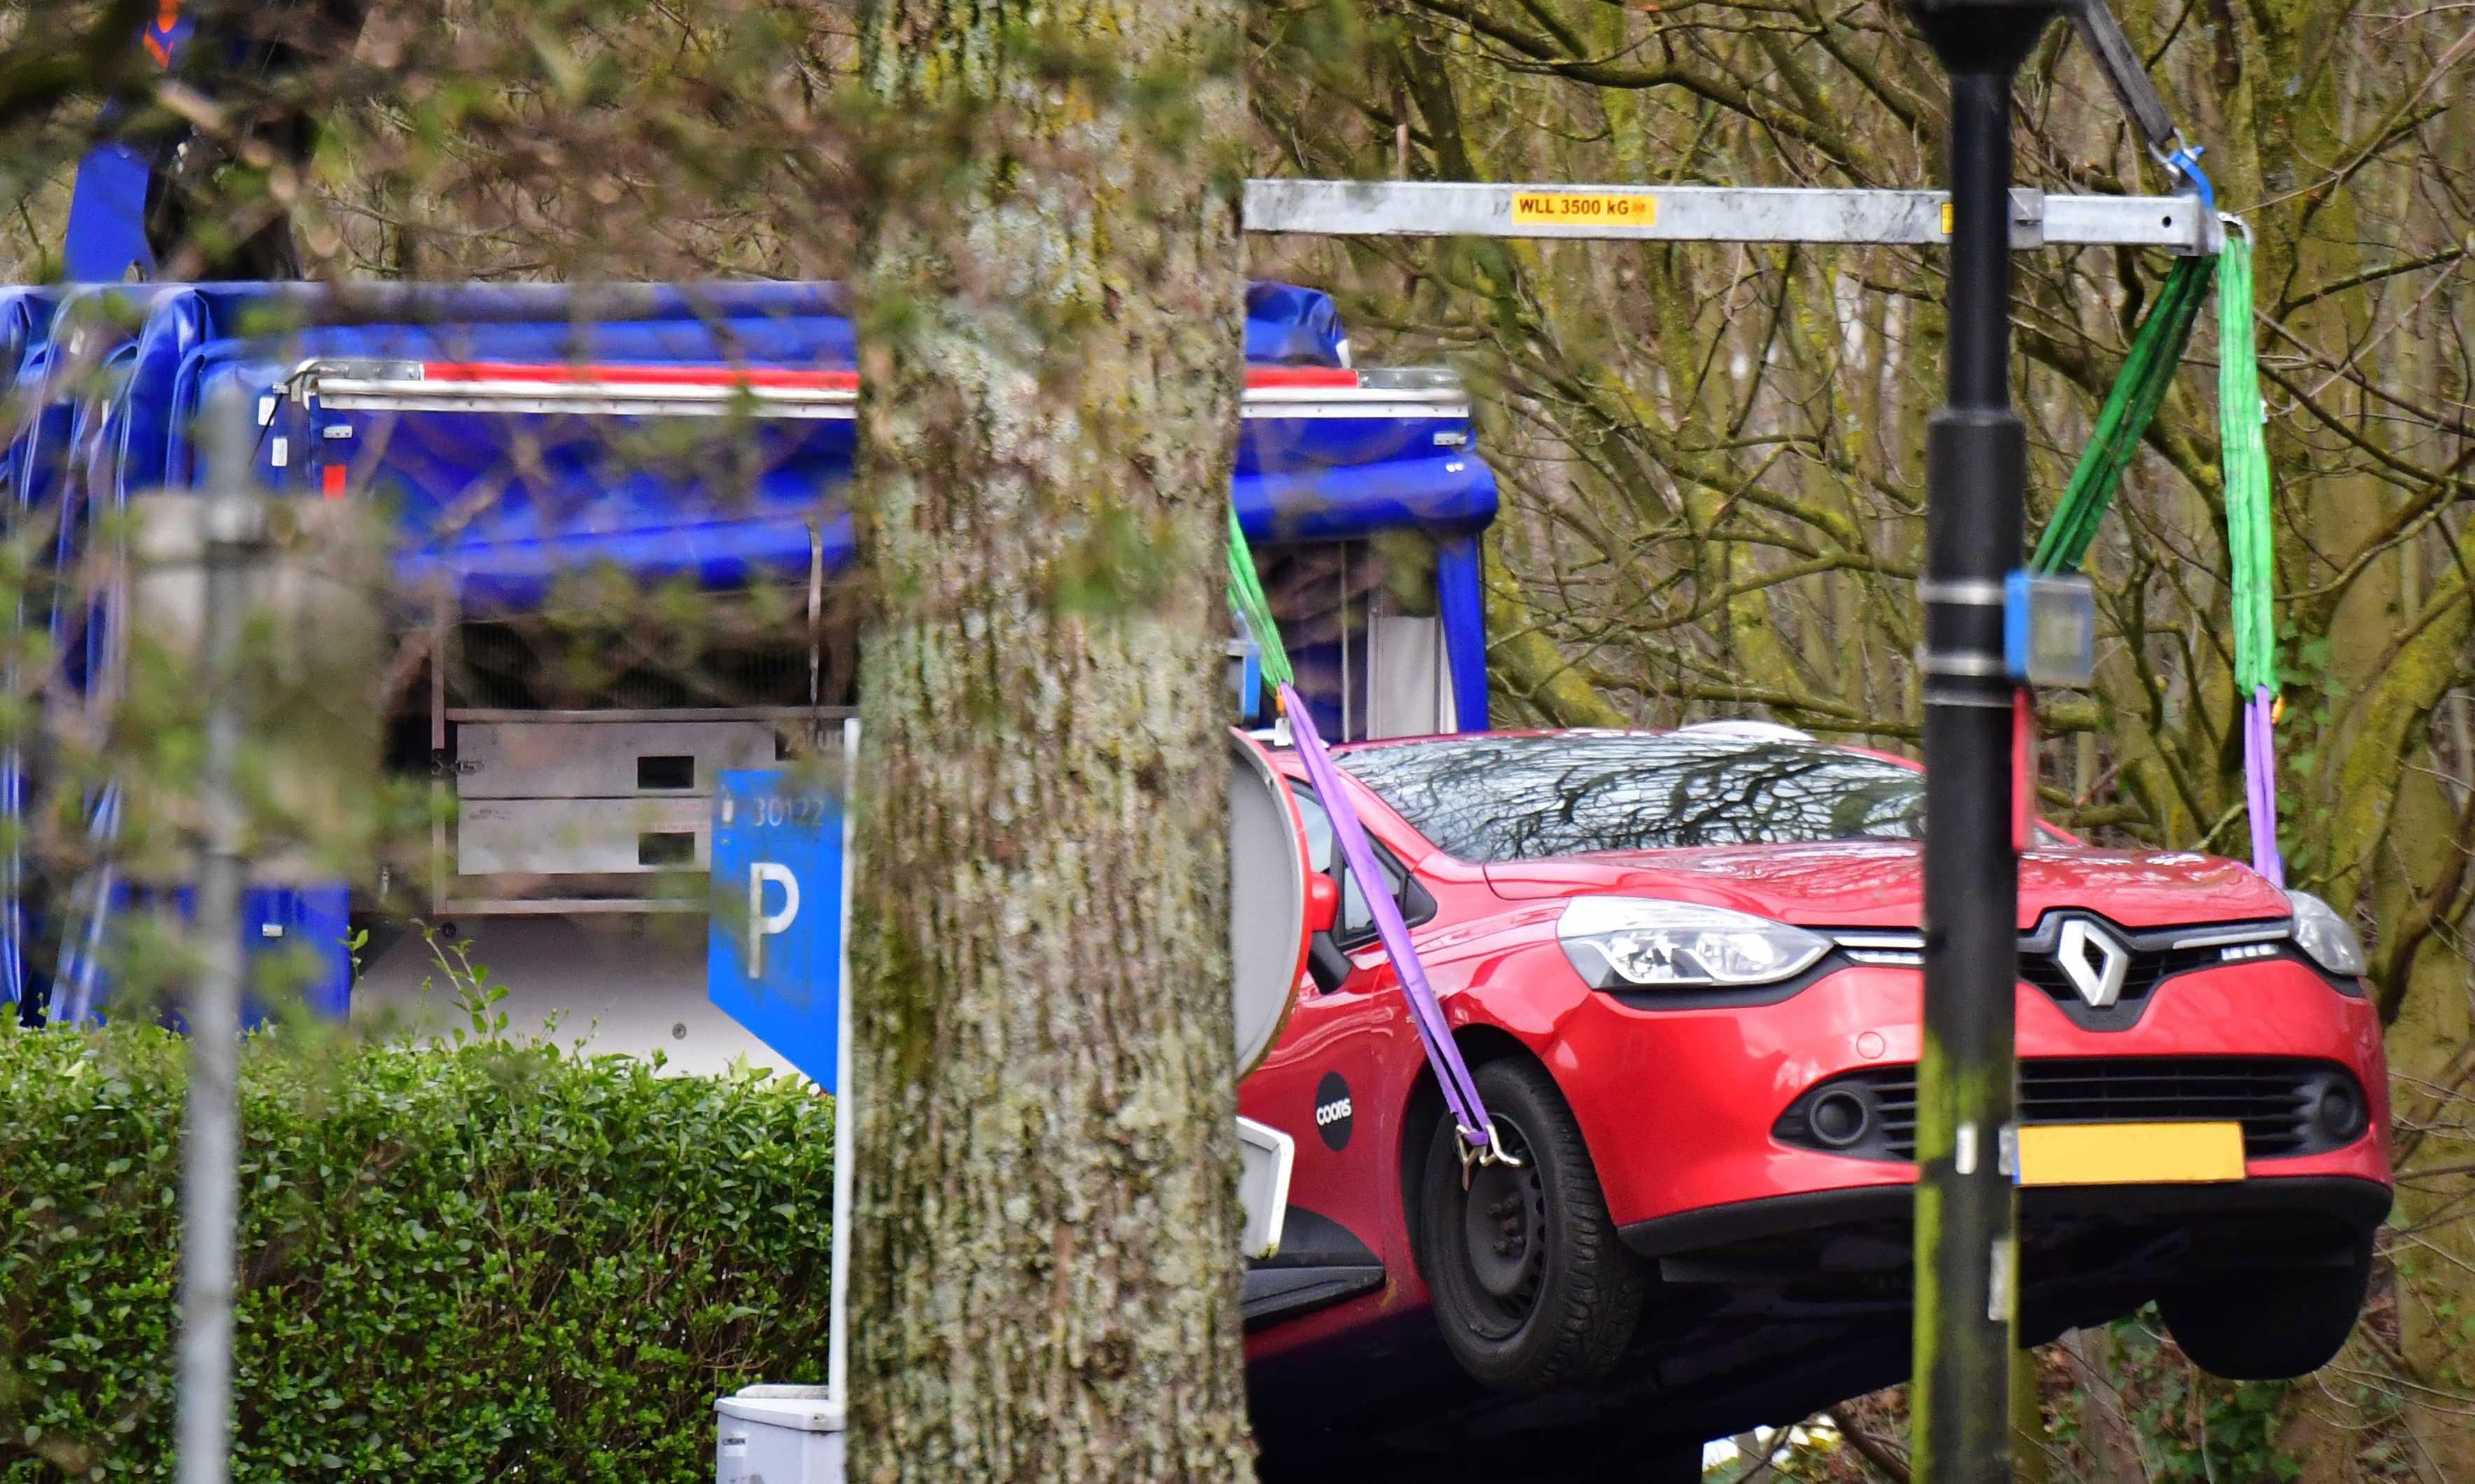 Letter in Utrecht getaway car may suggest terror motive